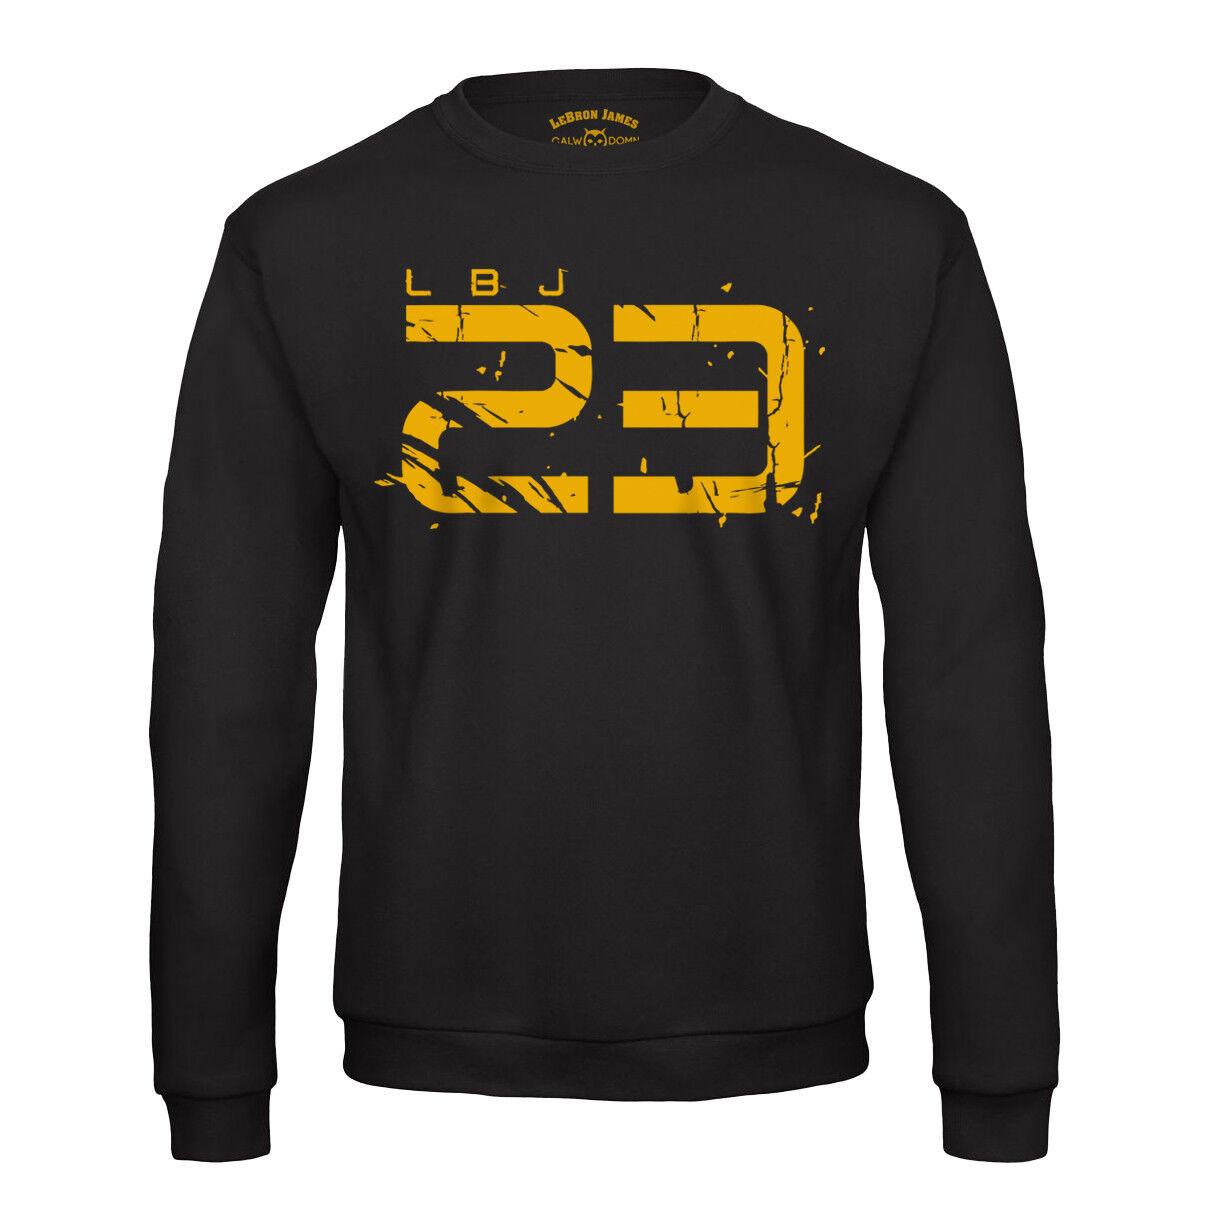 LBJ 23 Sweatshirt LeBron James Los Angeles Lakers Pullover Basketball Shirt